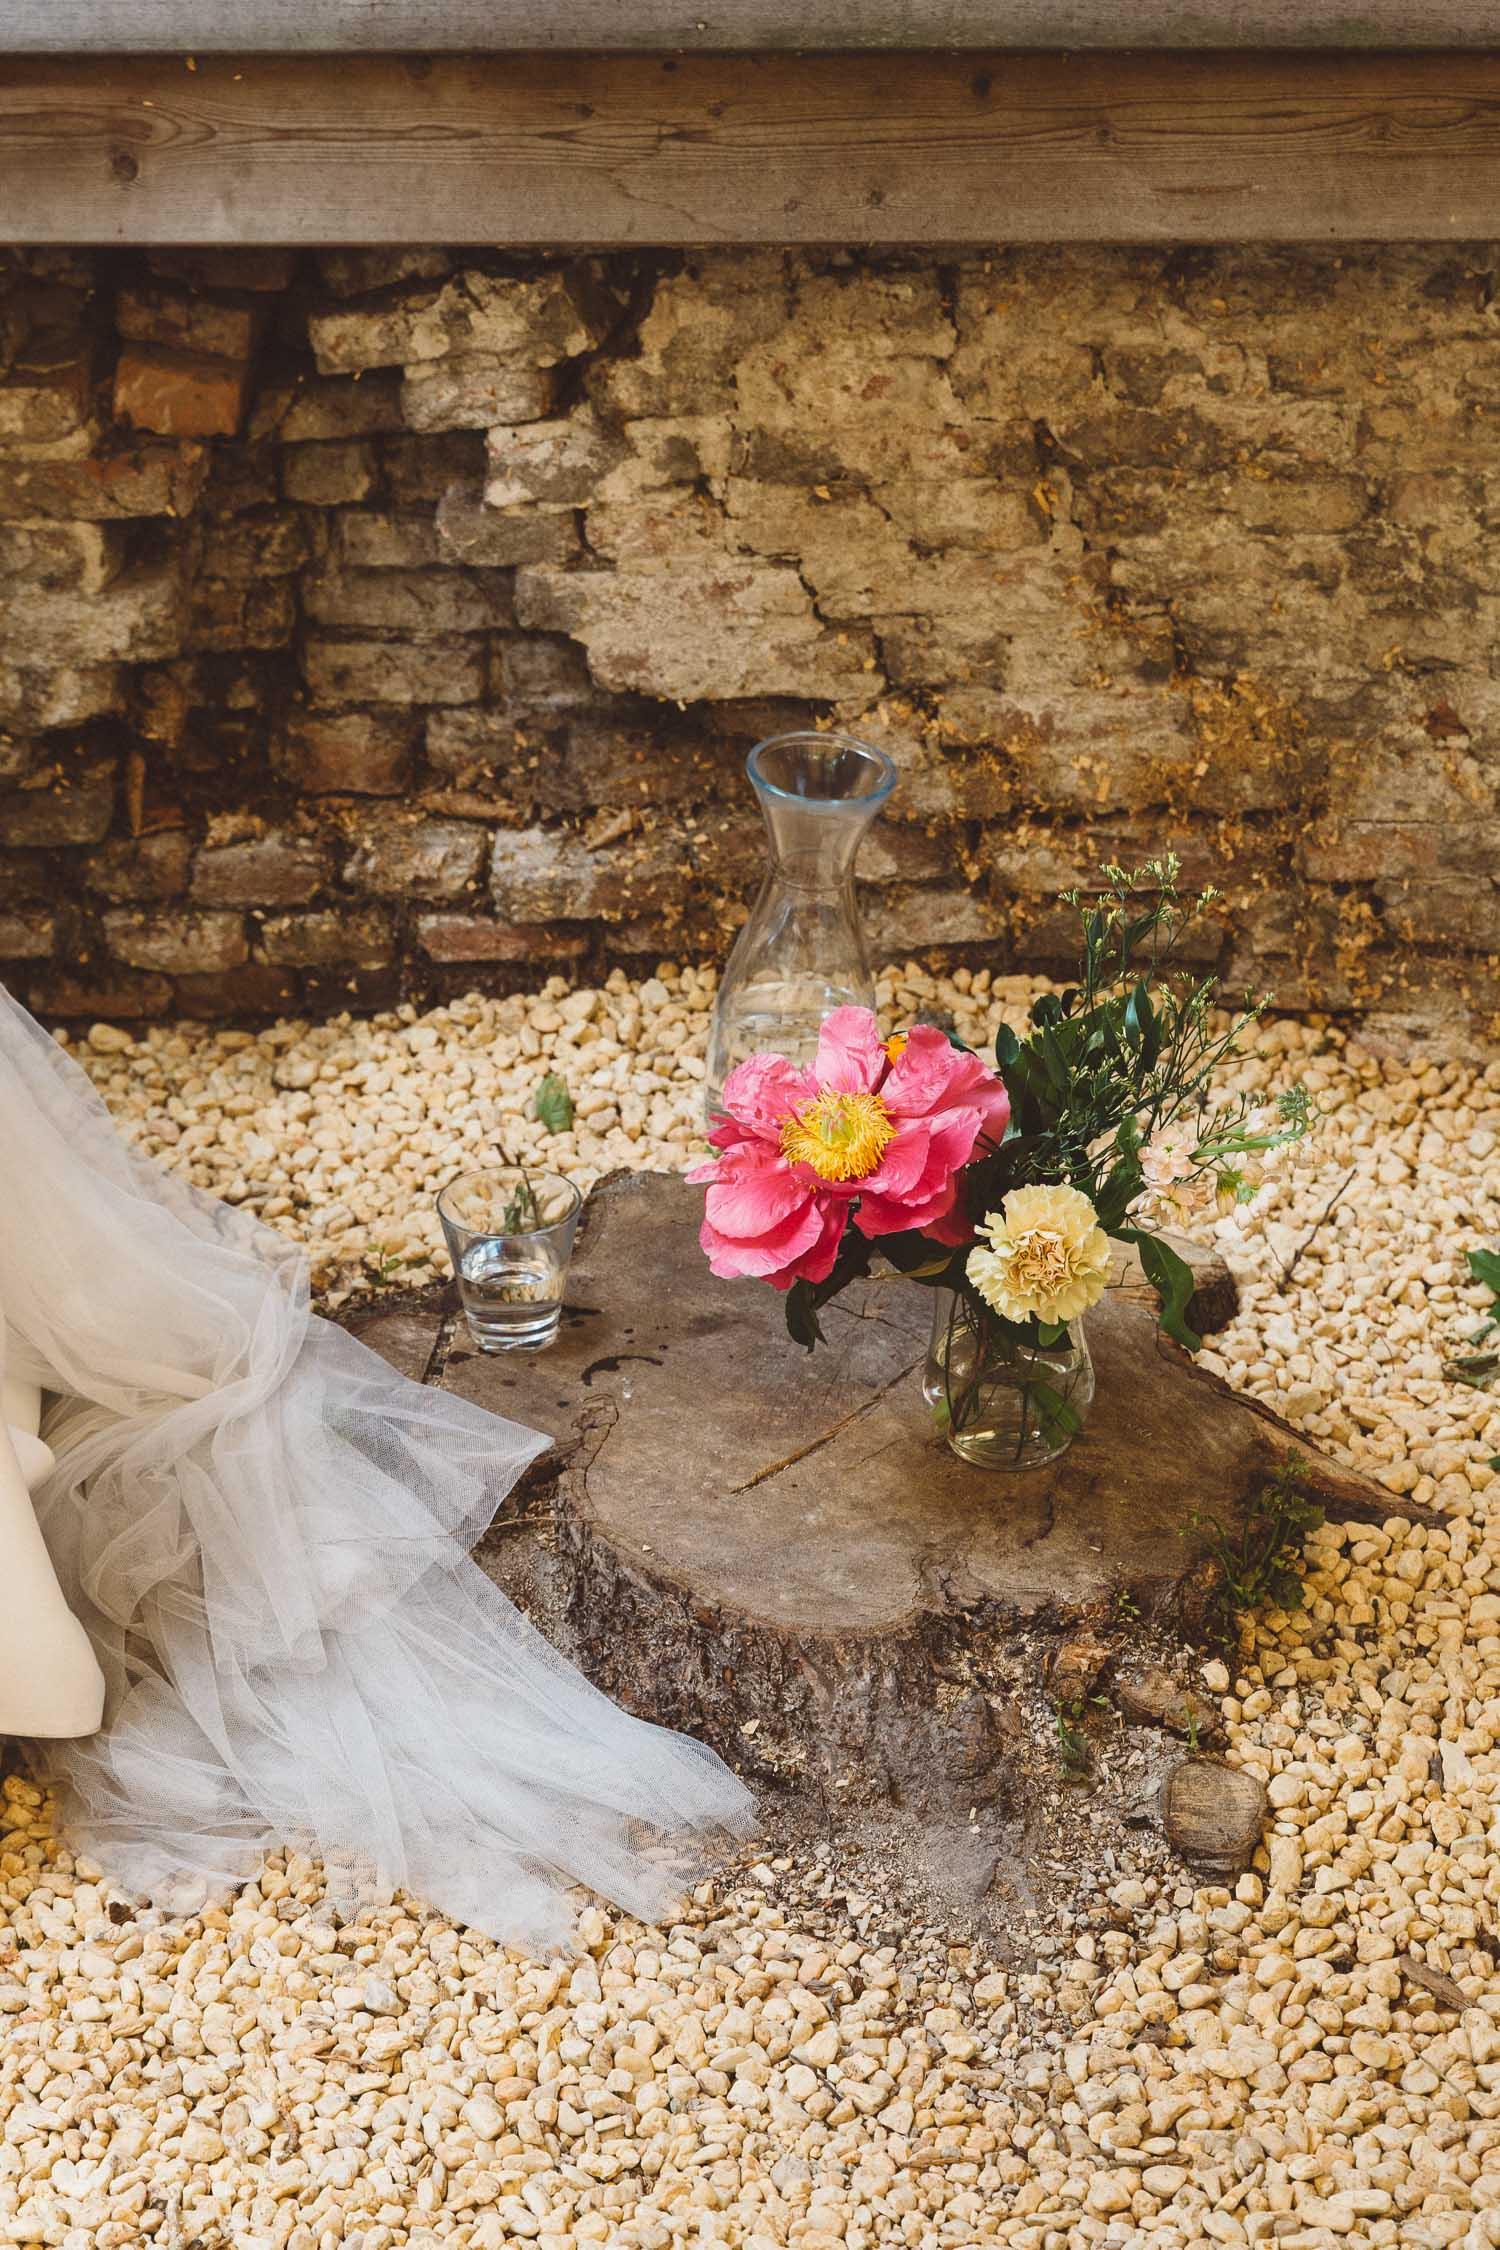 Backyard-wedding-Bruiloft-Annemiek-David-fotografie-photography-On-a-hazy-morning-Amsterdam-The-Netherlands153.jpg